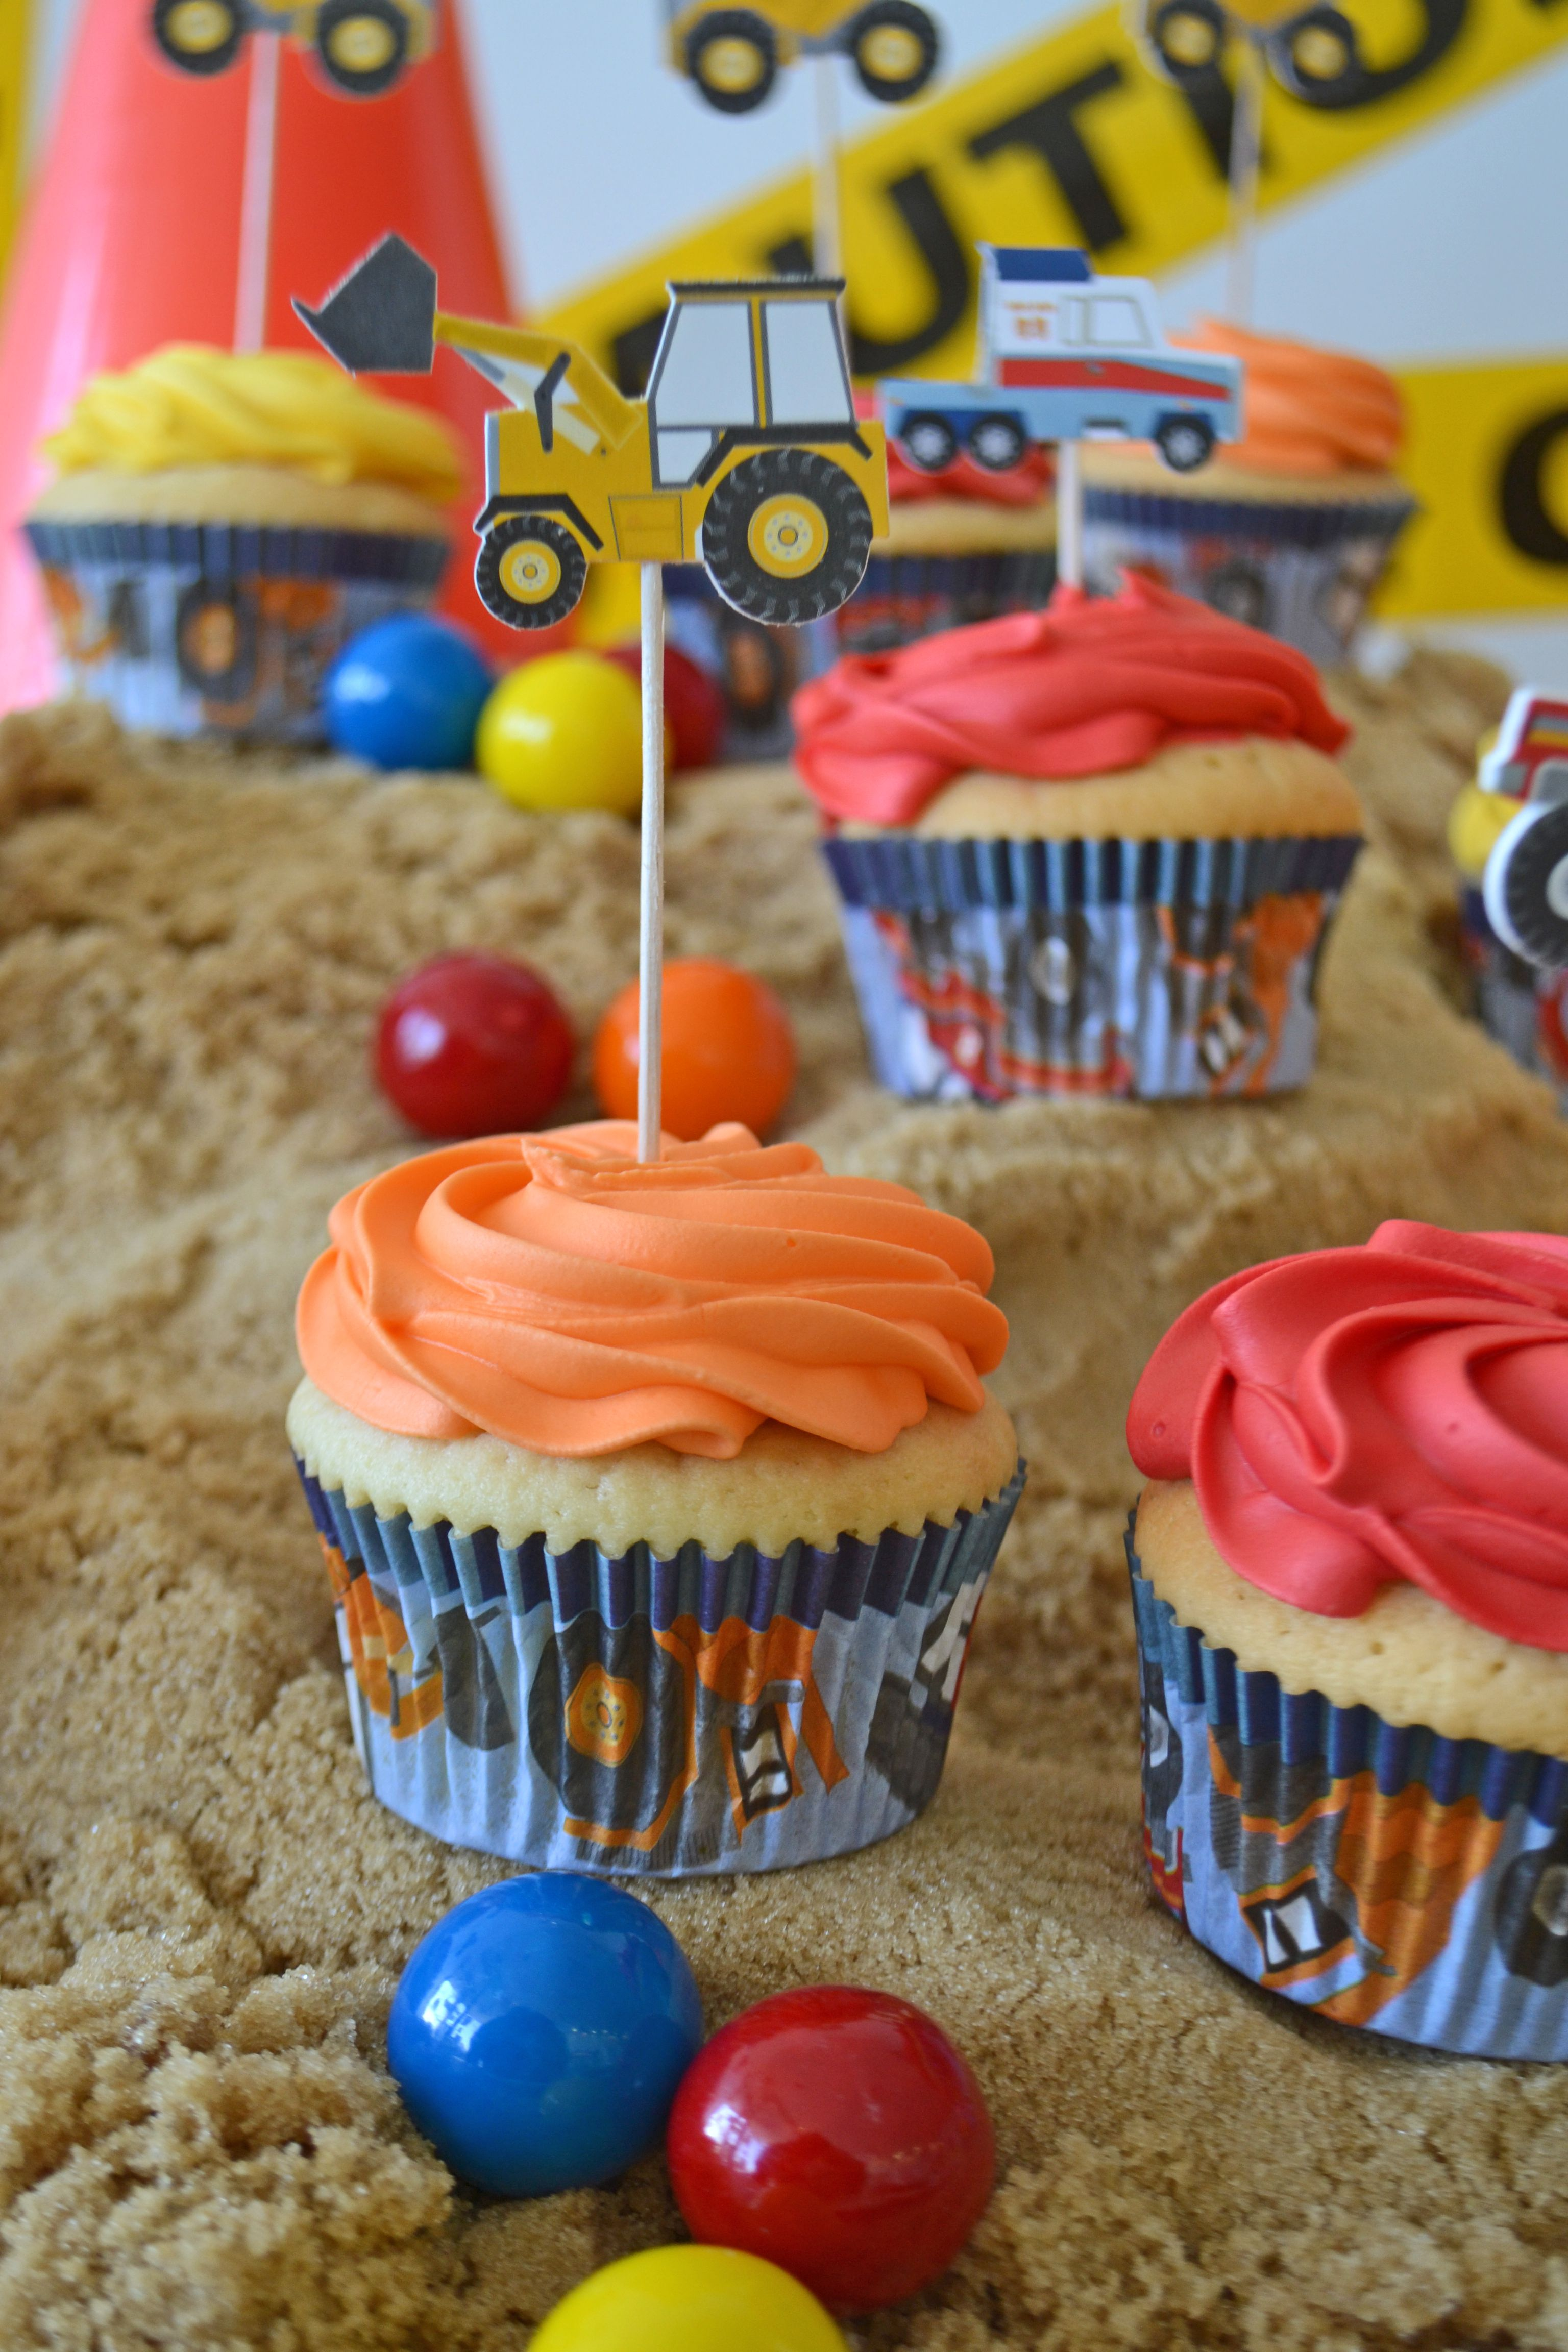 Bulldozer cupcakes by Bake Sale.